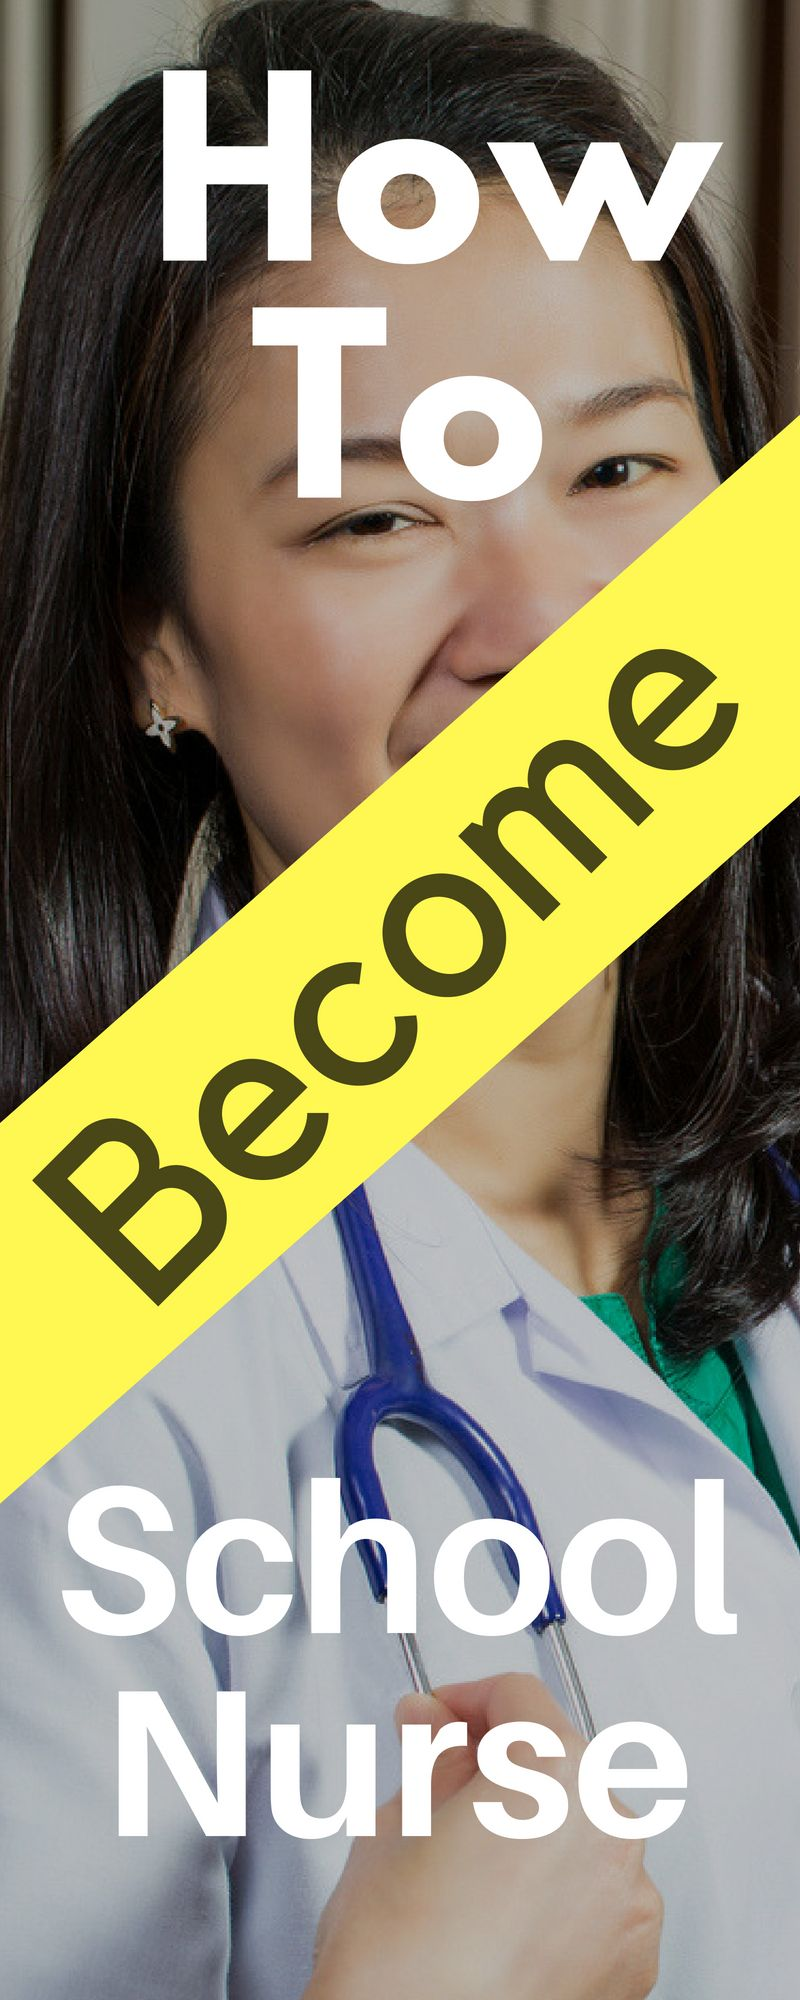 How To Become A School Nurse Job Description Salary And Benefits